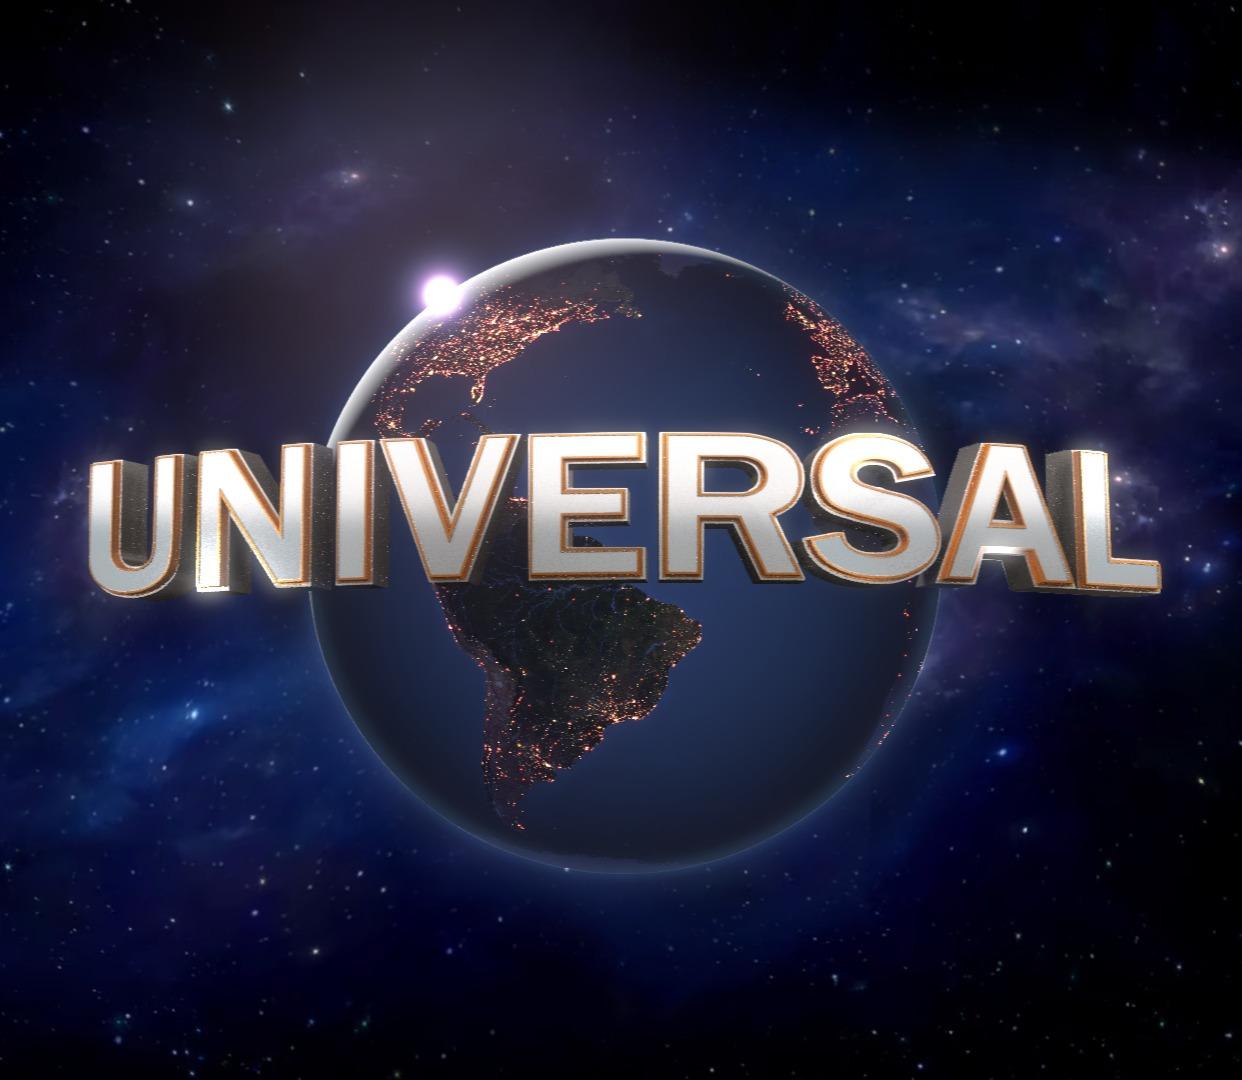 Universal_logo_edited